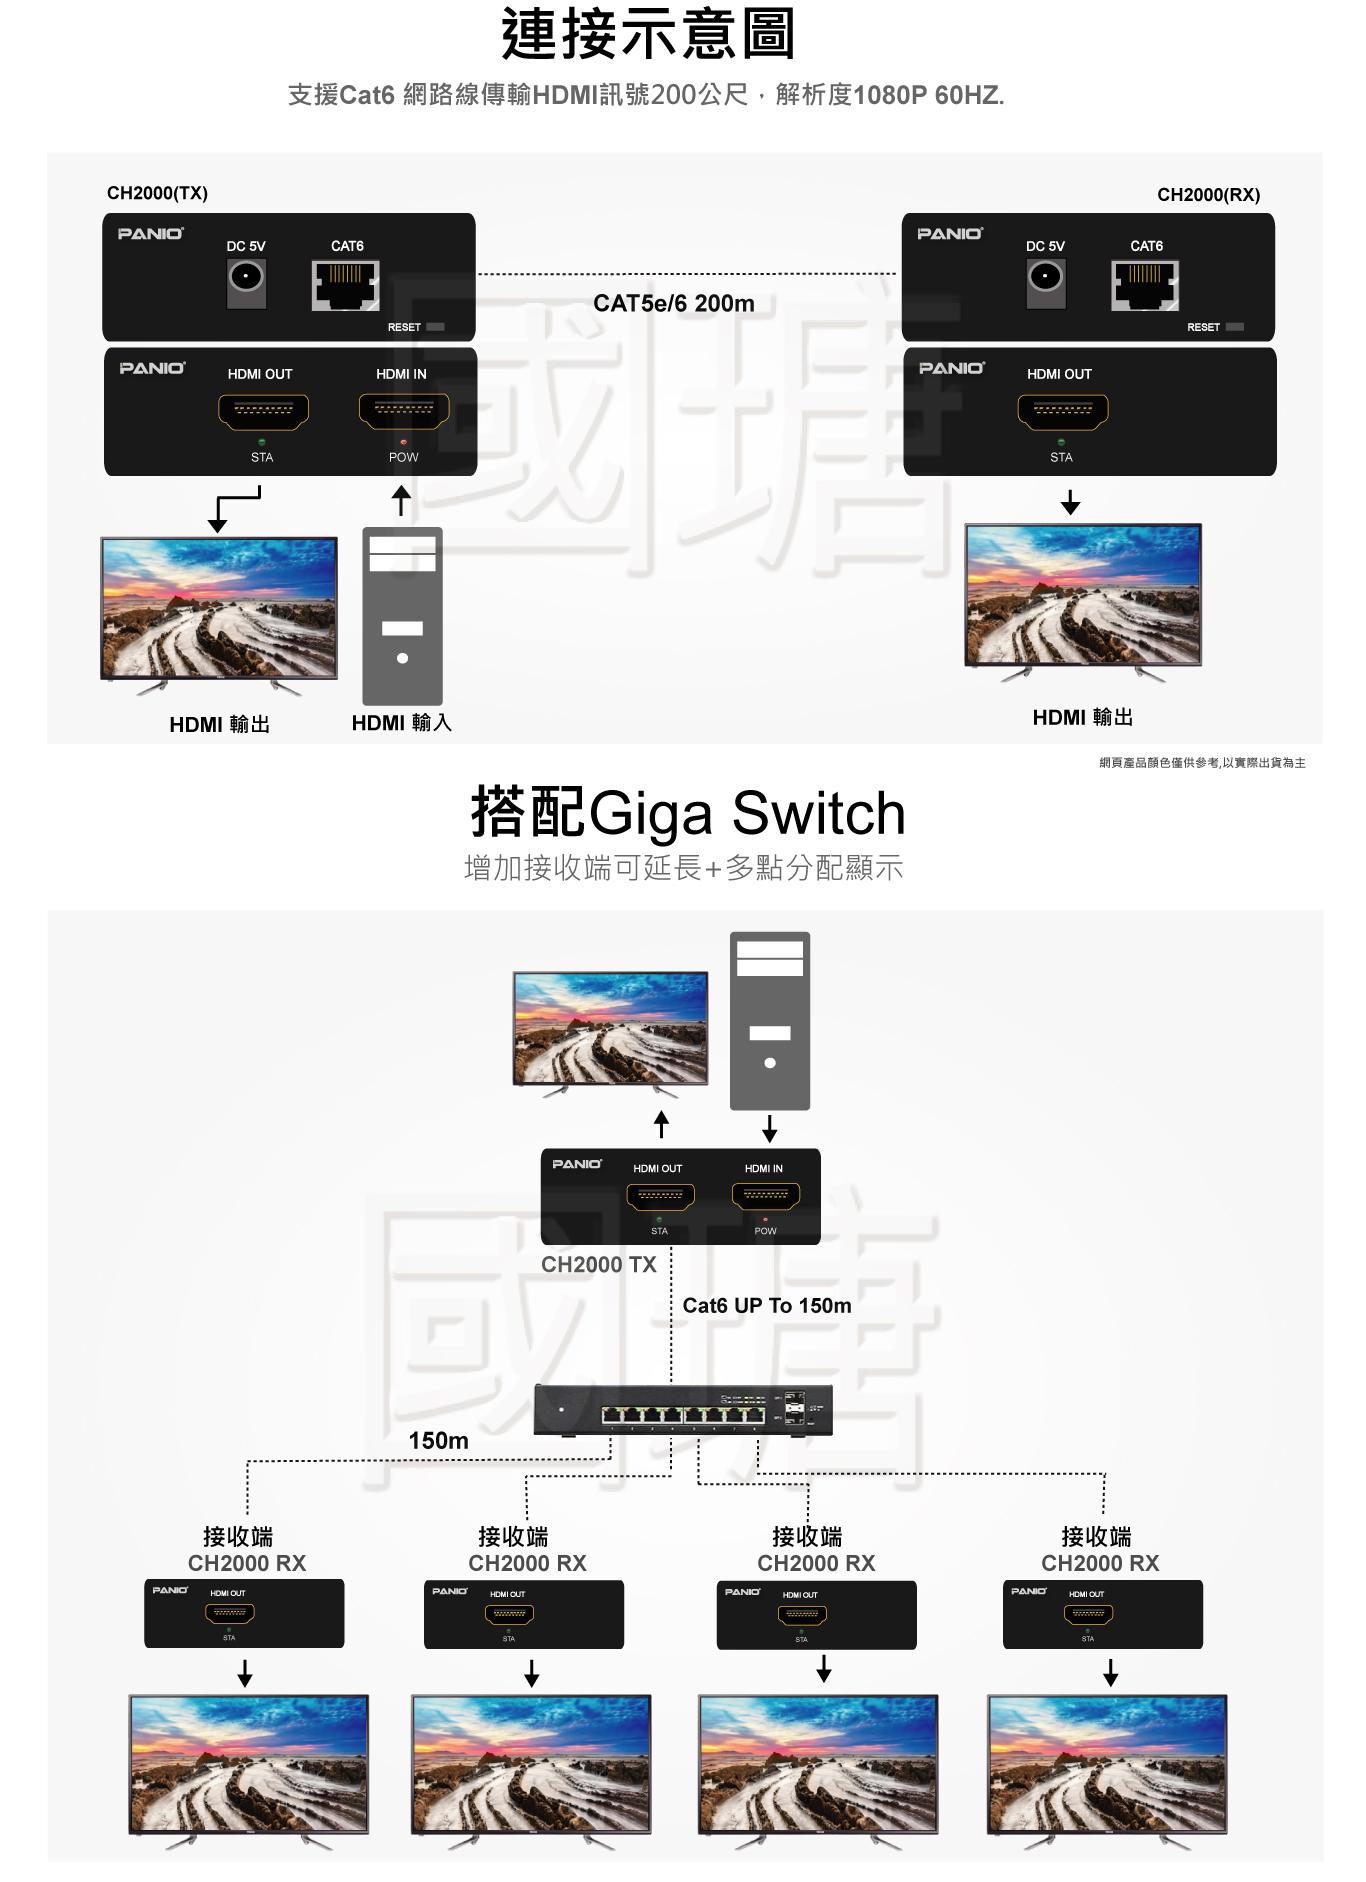 1080P HDMI 200米影音訊號延長器